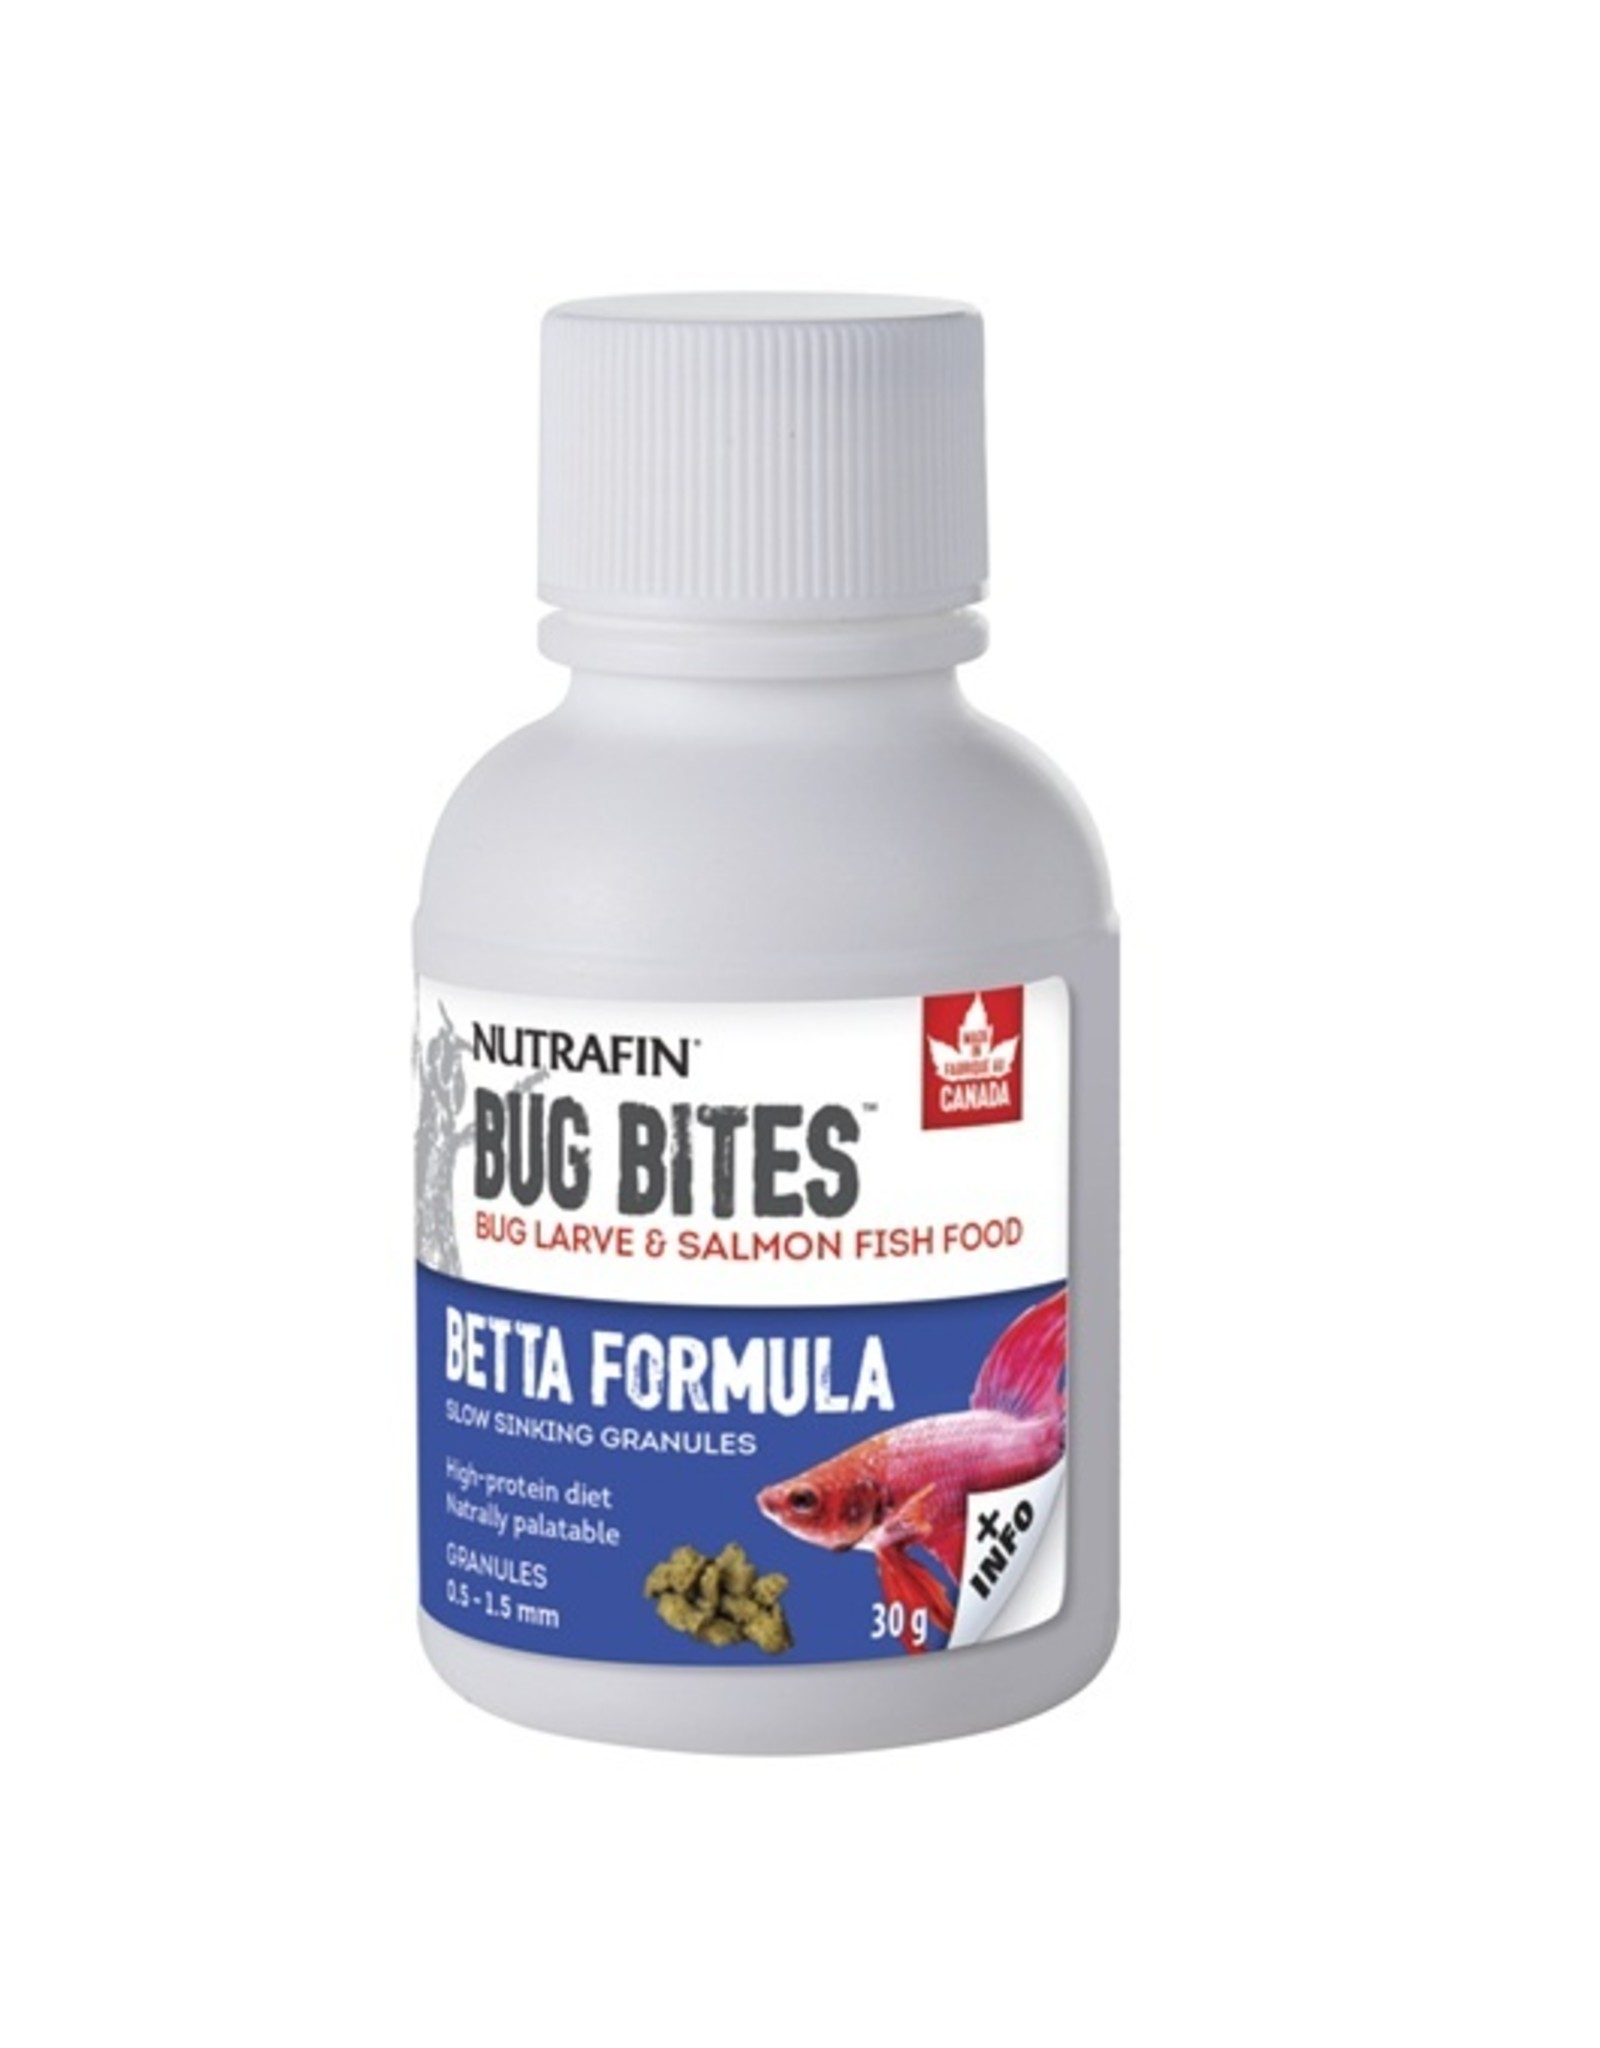 Nutrafin Bug Bites Betta Formula 0.5-1.5mm granules 30g (1.0oz)